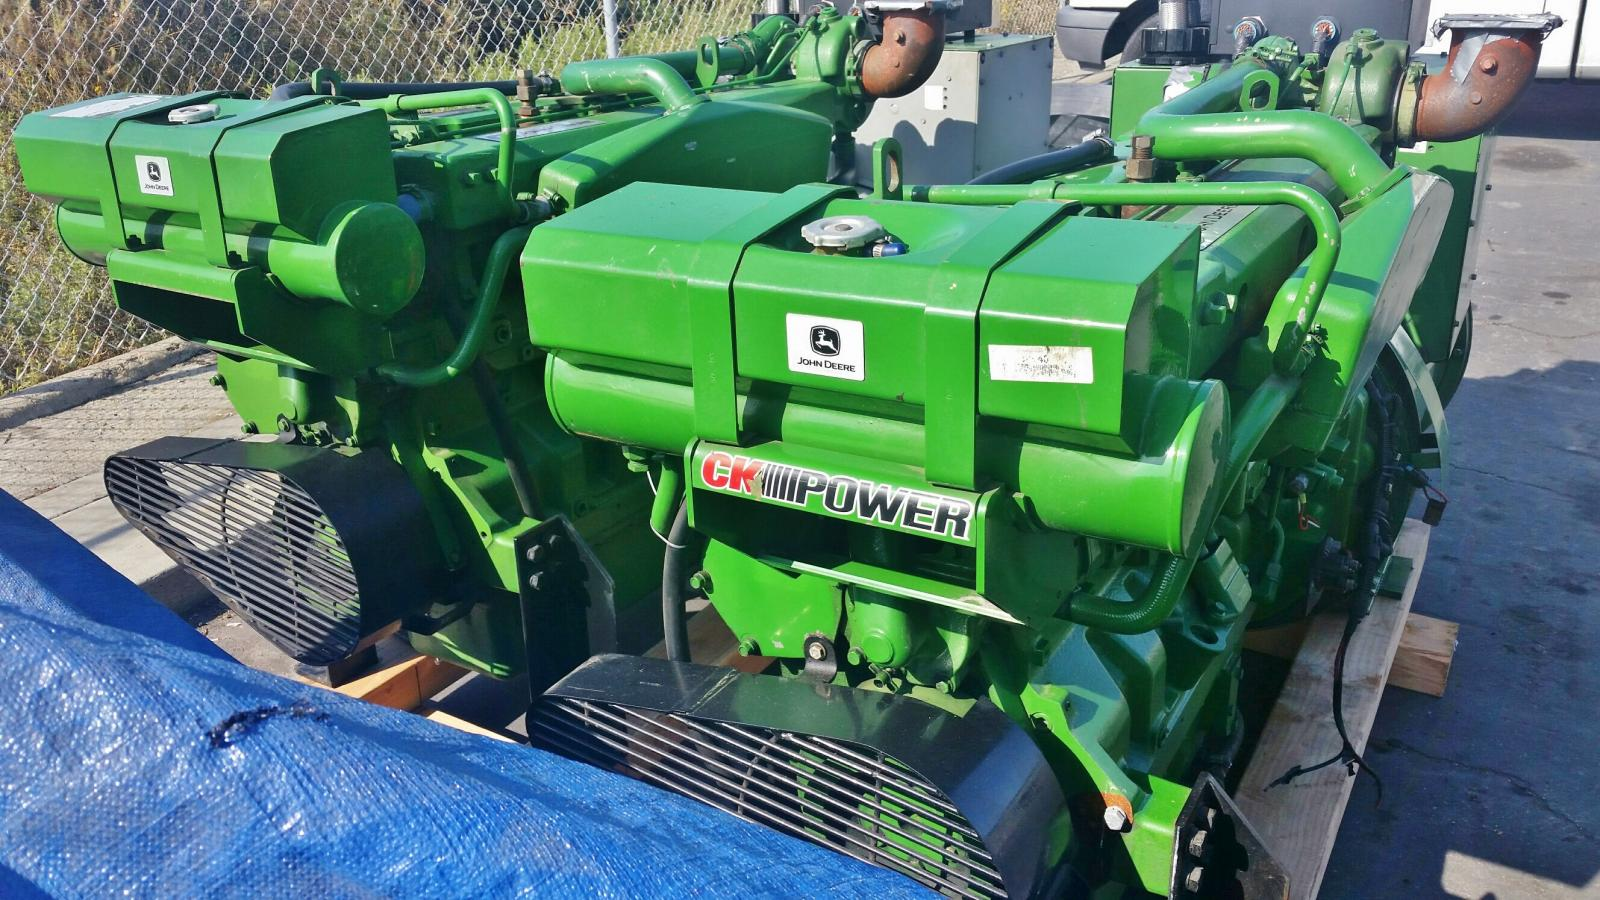 John Deere 60 Generator : Buy john deere afm kw diesel generator